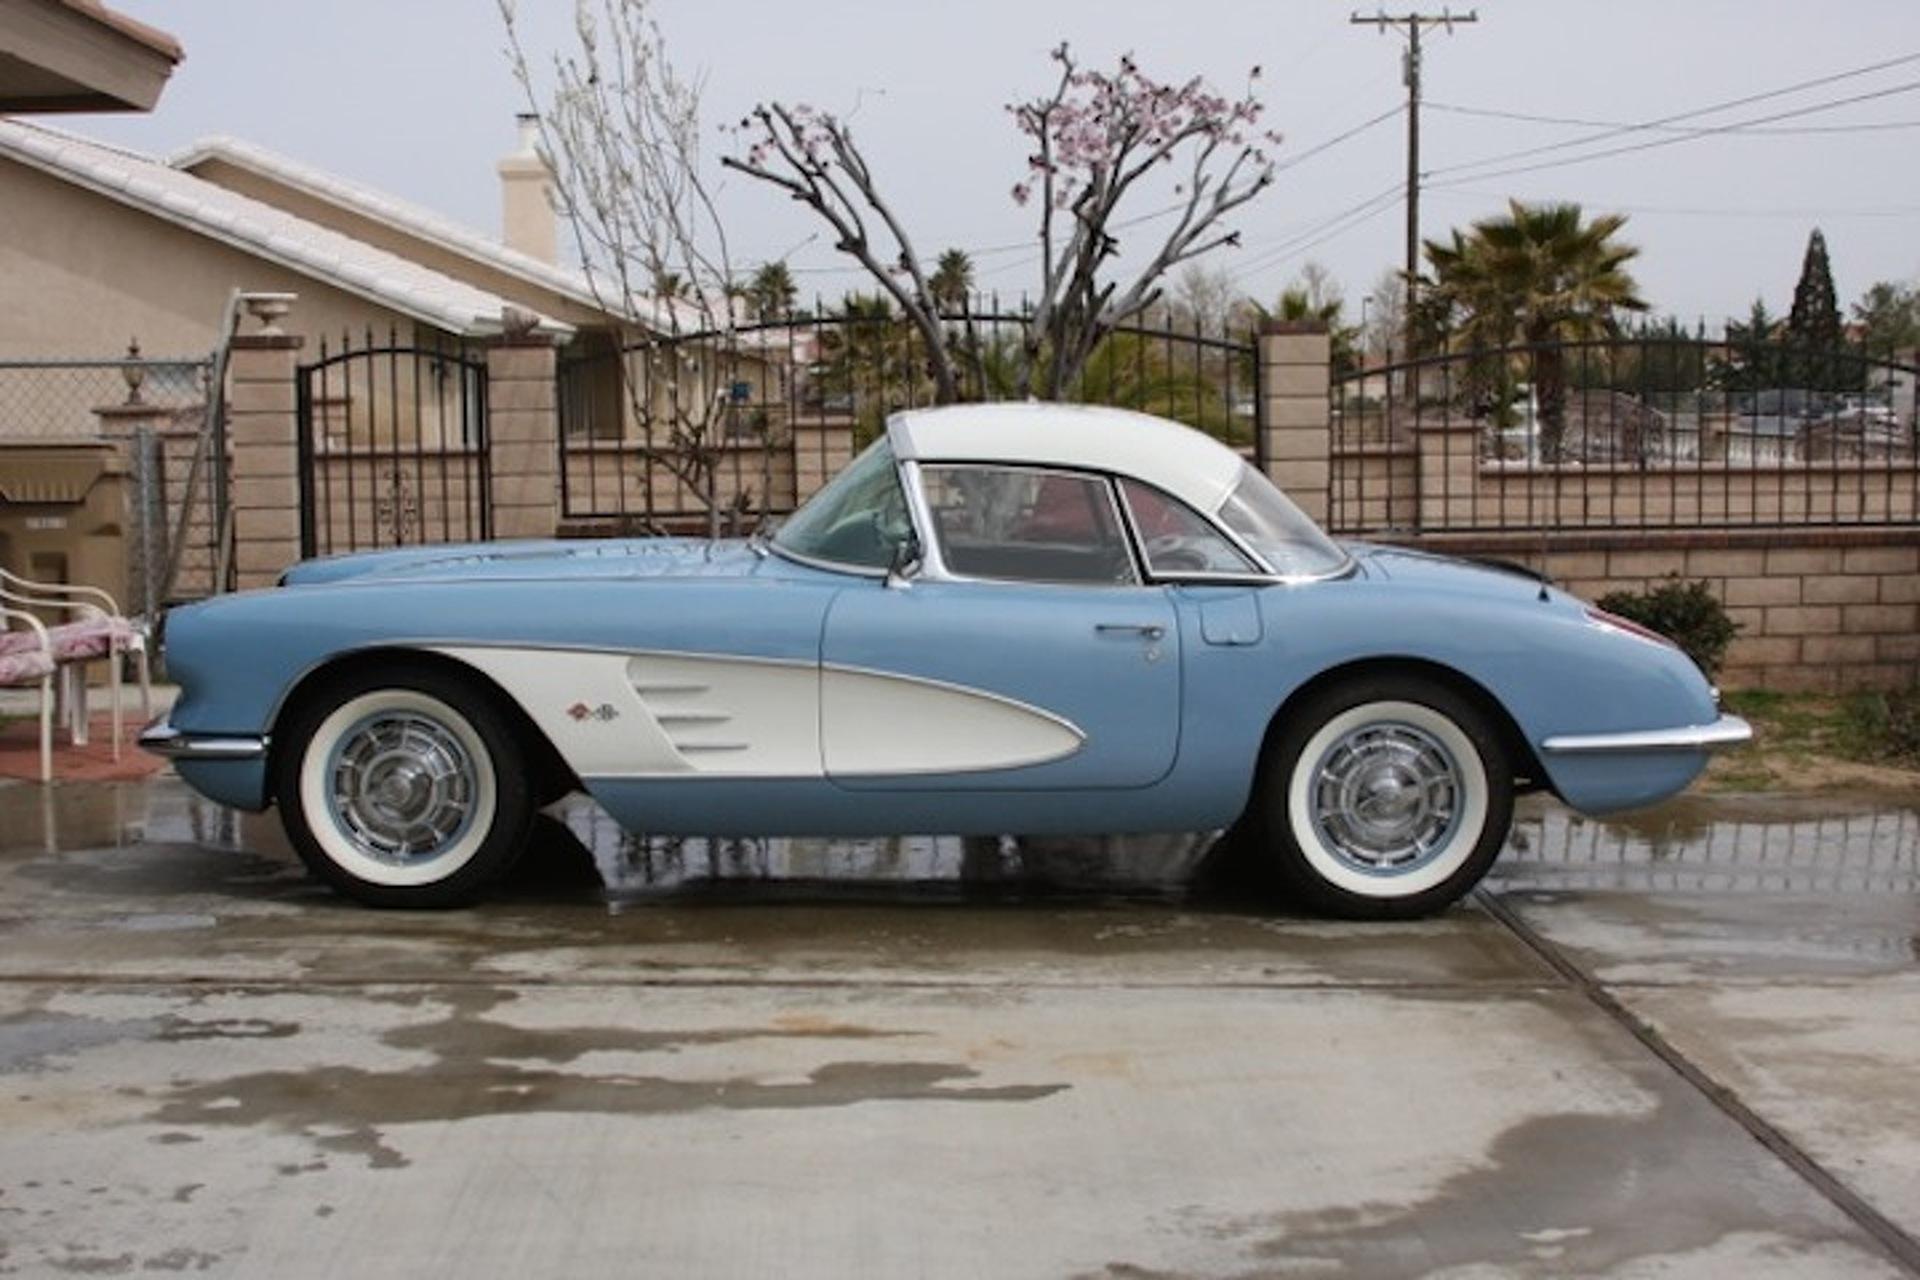 Your Ride: 1960 Chevrolet Corvette Roadster